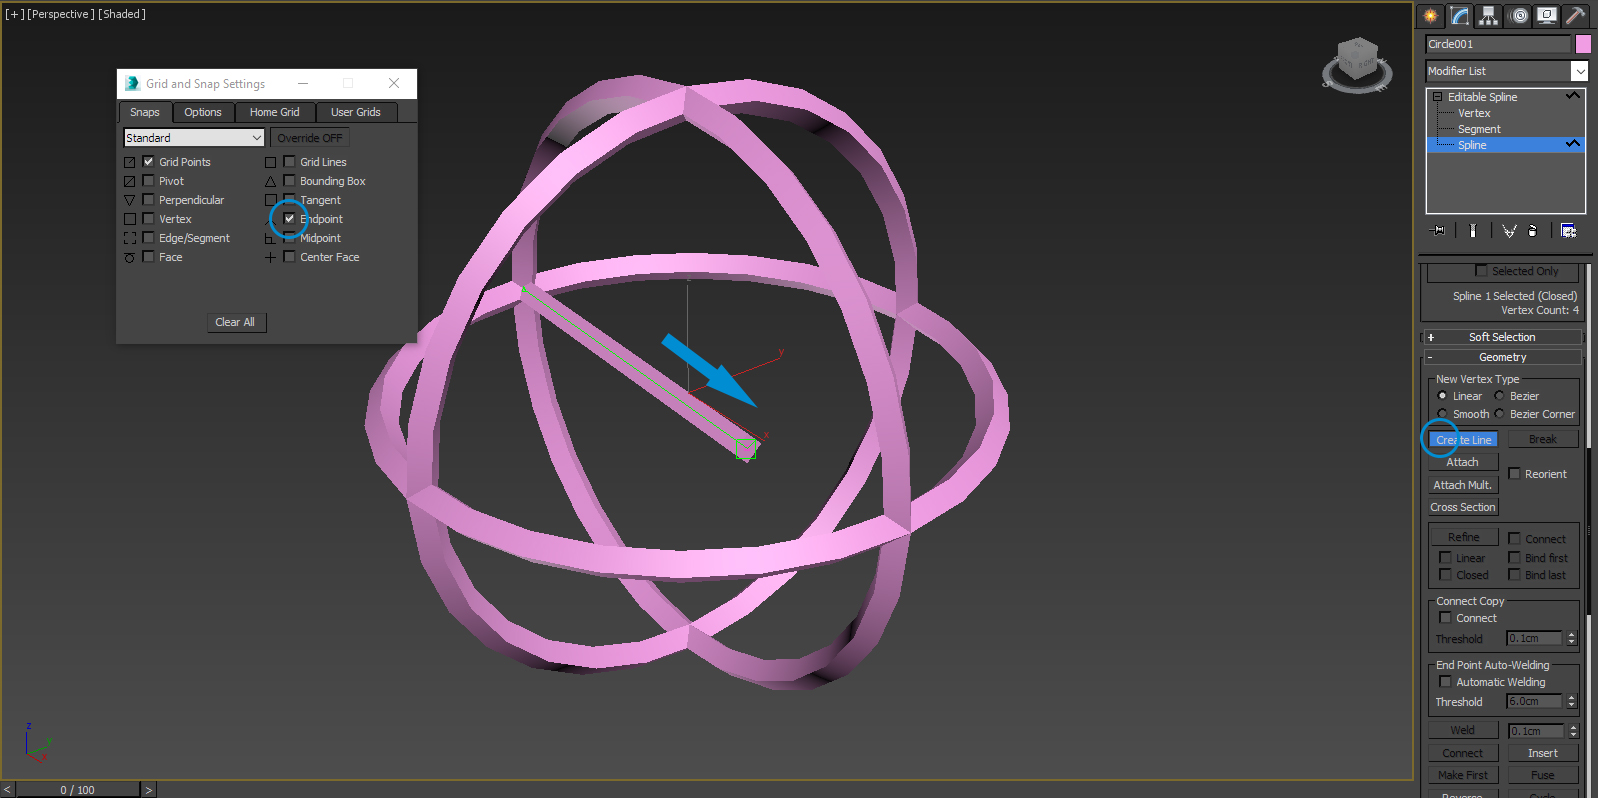 Devblog 3: Complete FPS Arms Rig and Animation Tutorial